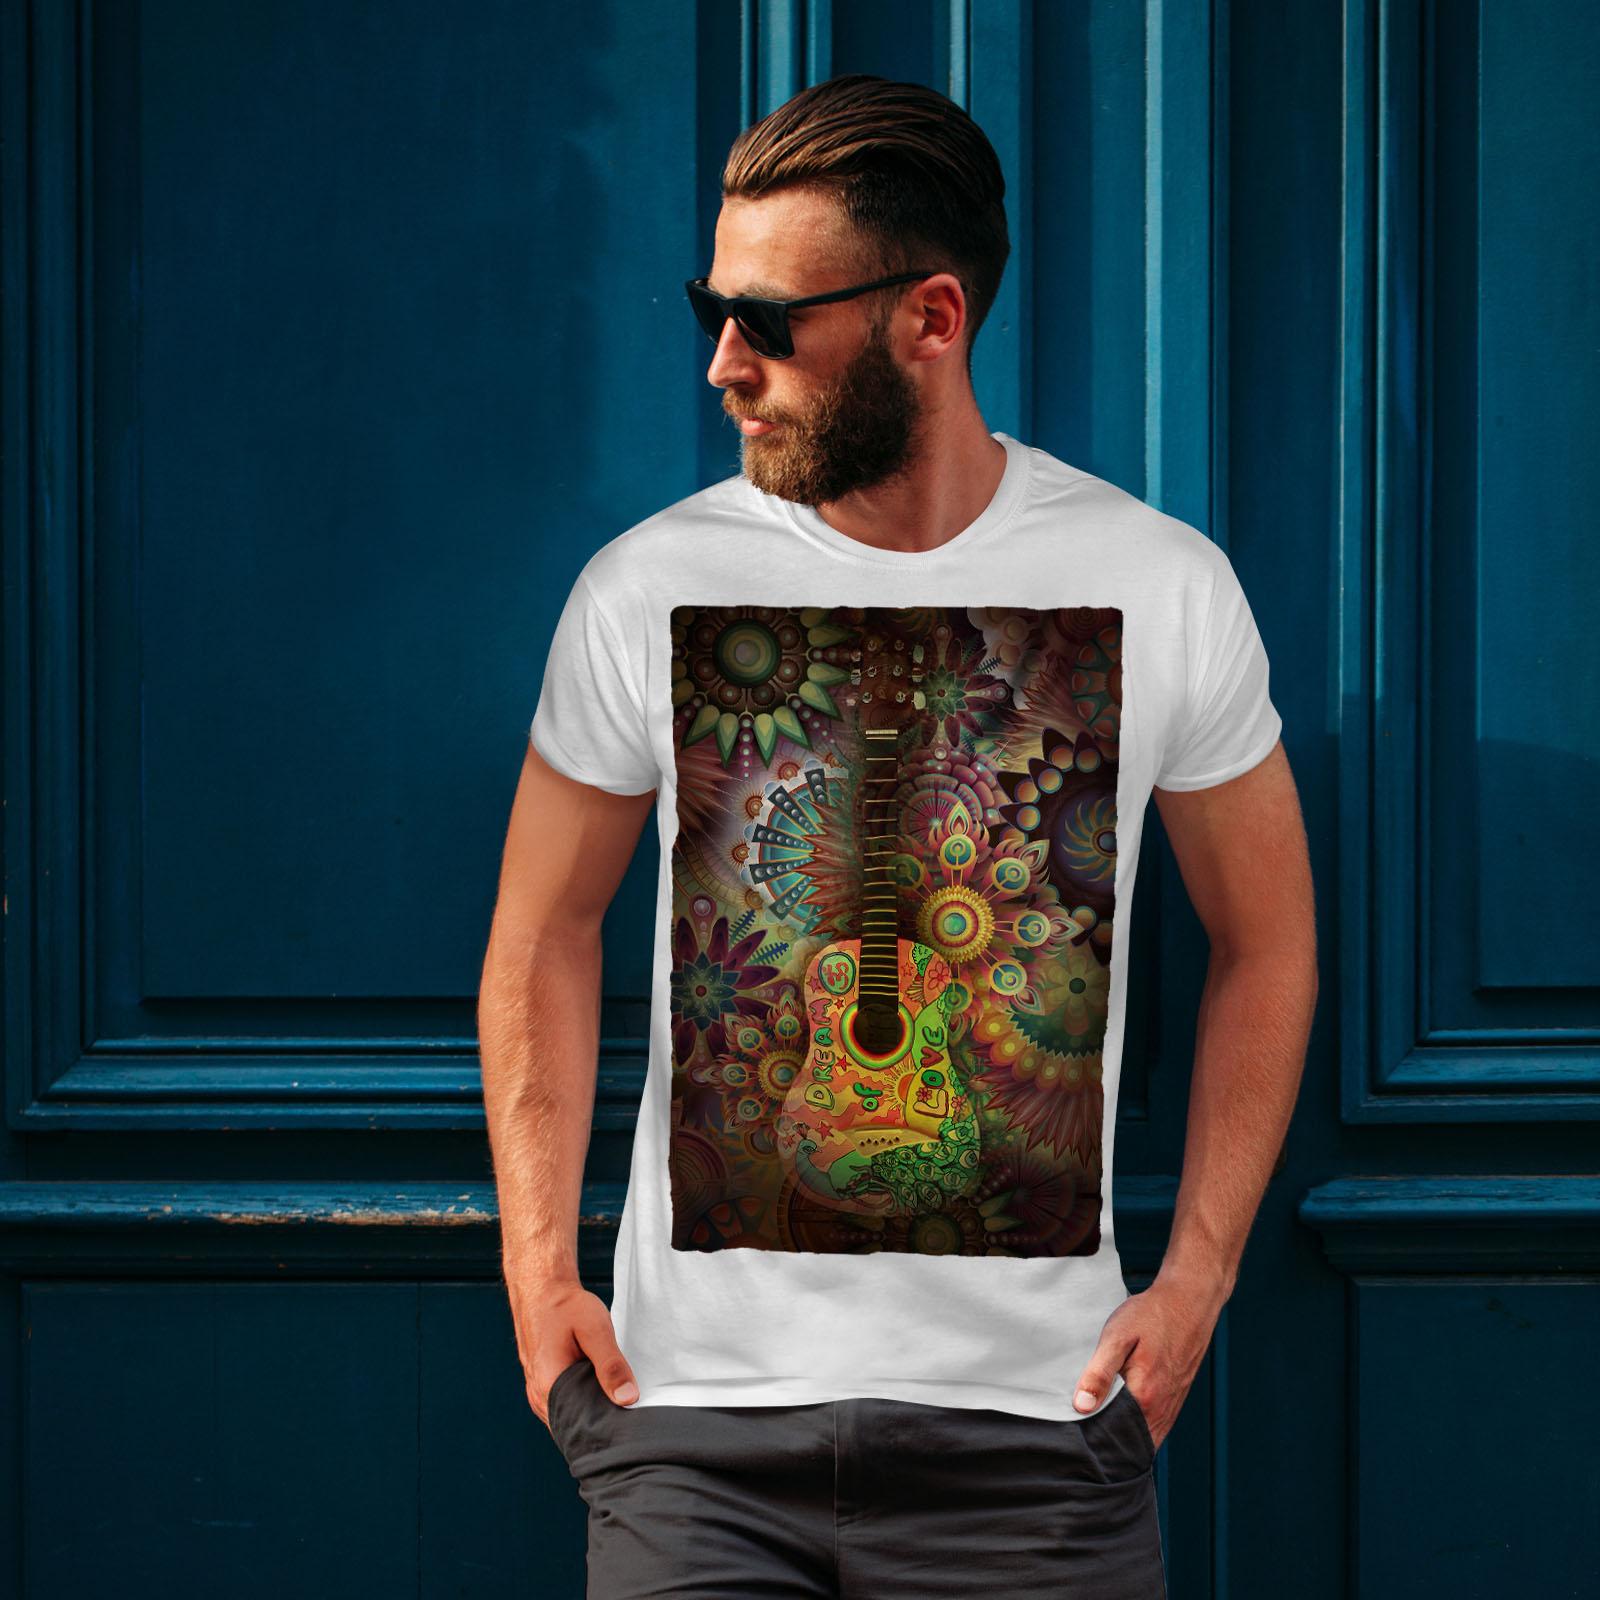 Wellcoda-Colorful-Guitar-Mens-T-shirt-Music-Graphic-Design-Printed-Tee thumbnail 10